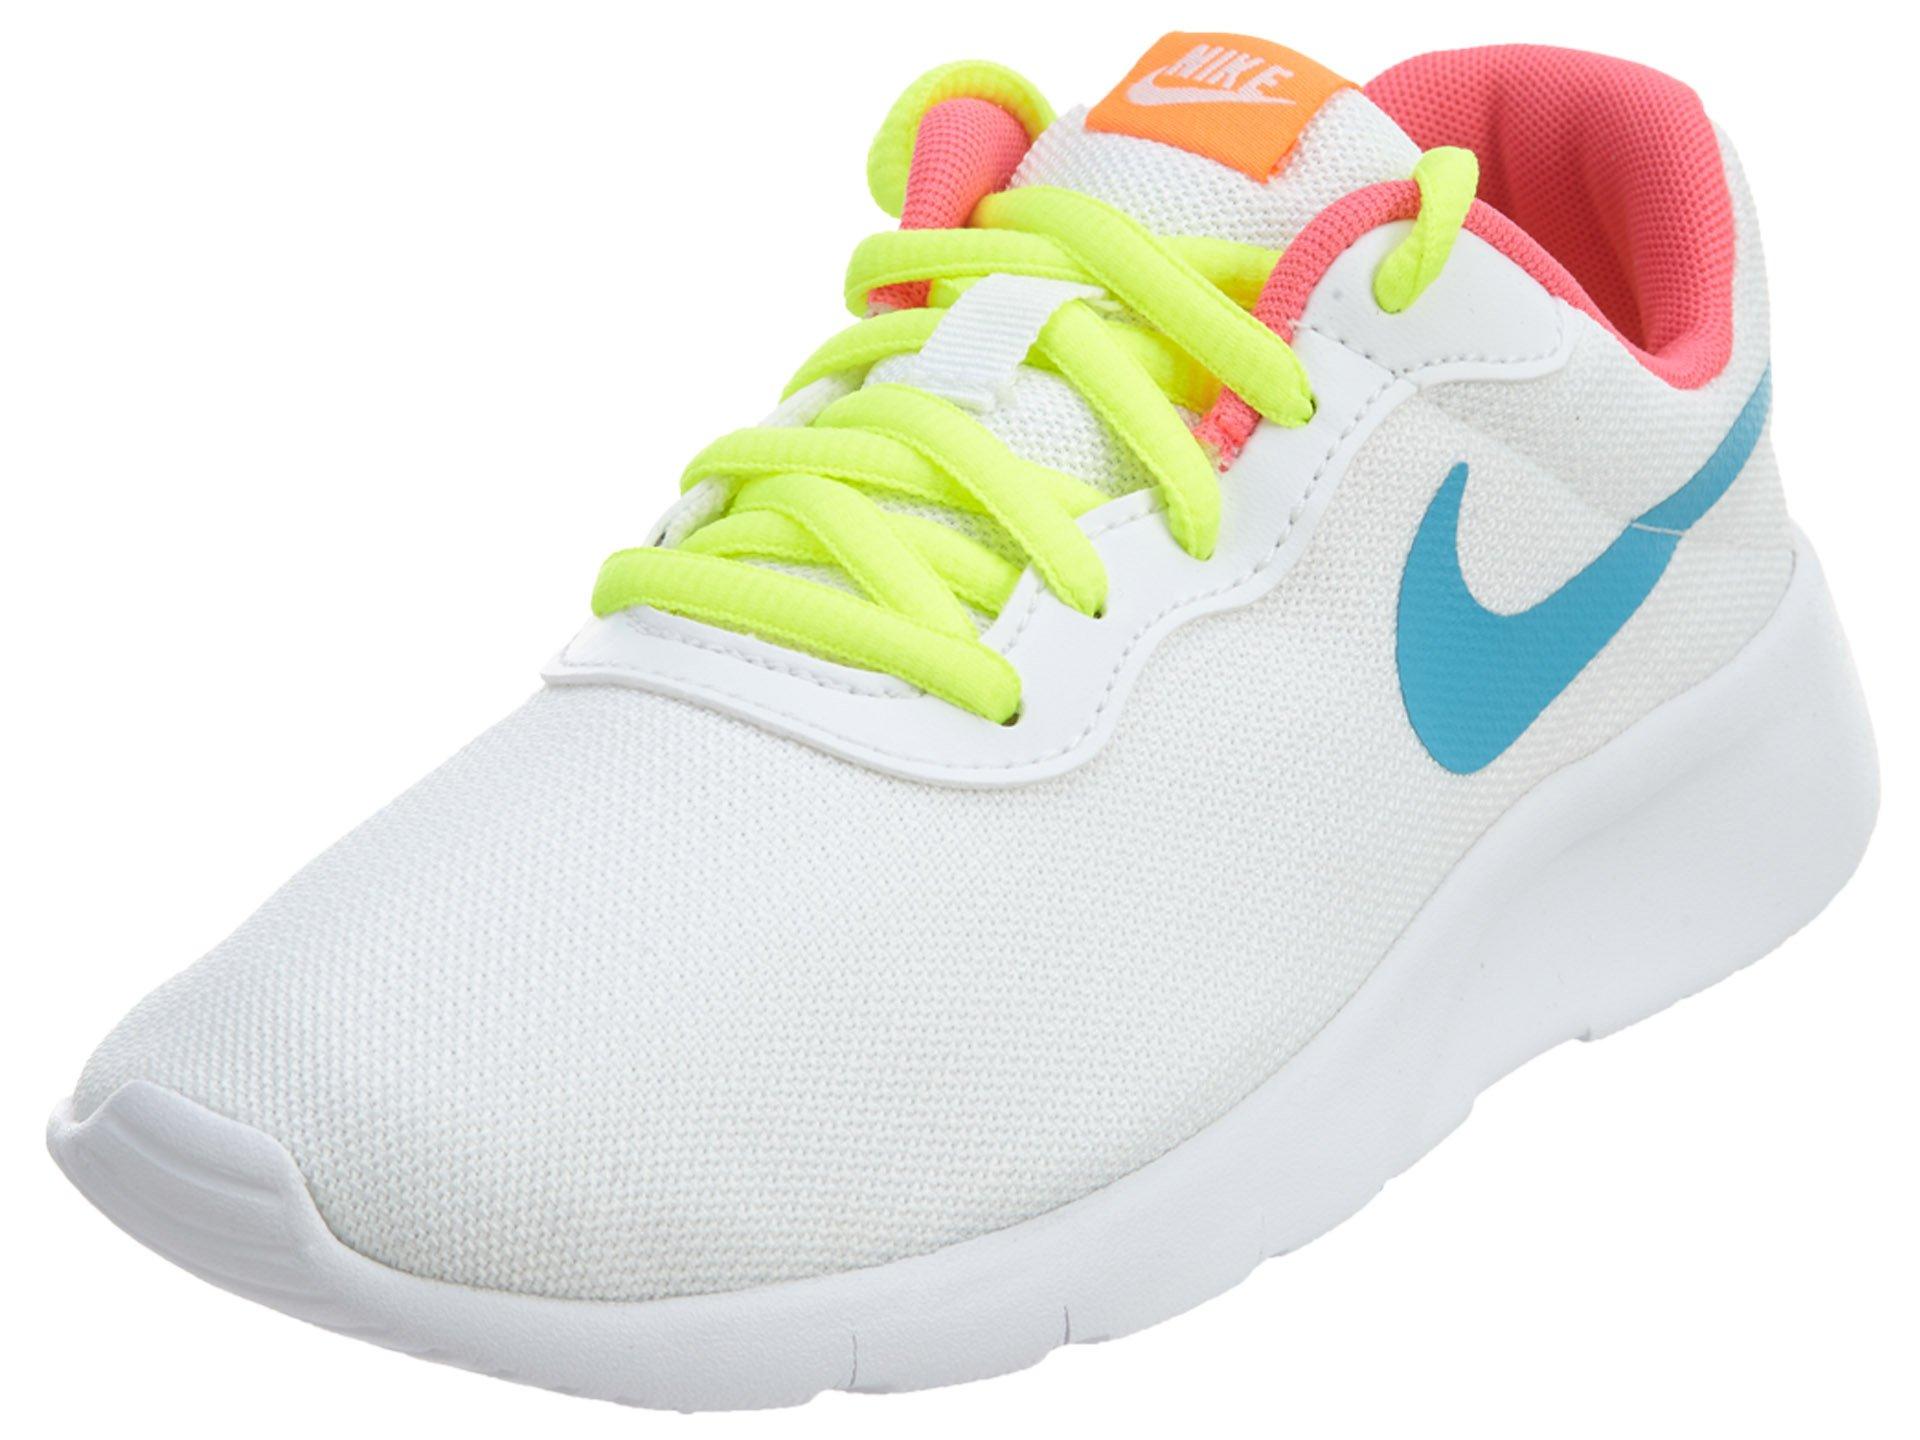 NIKE Tanjun Little Kids Style: 818385-100 Size: 3 by Nike (Image #1)